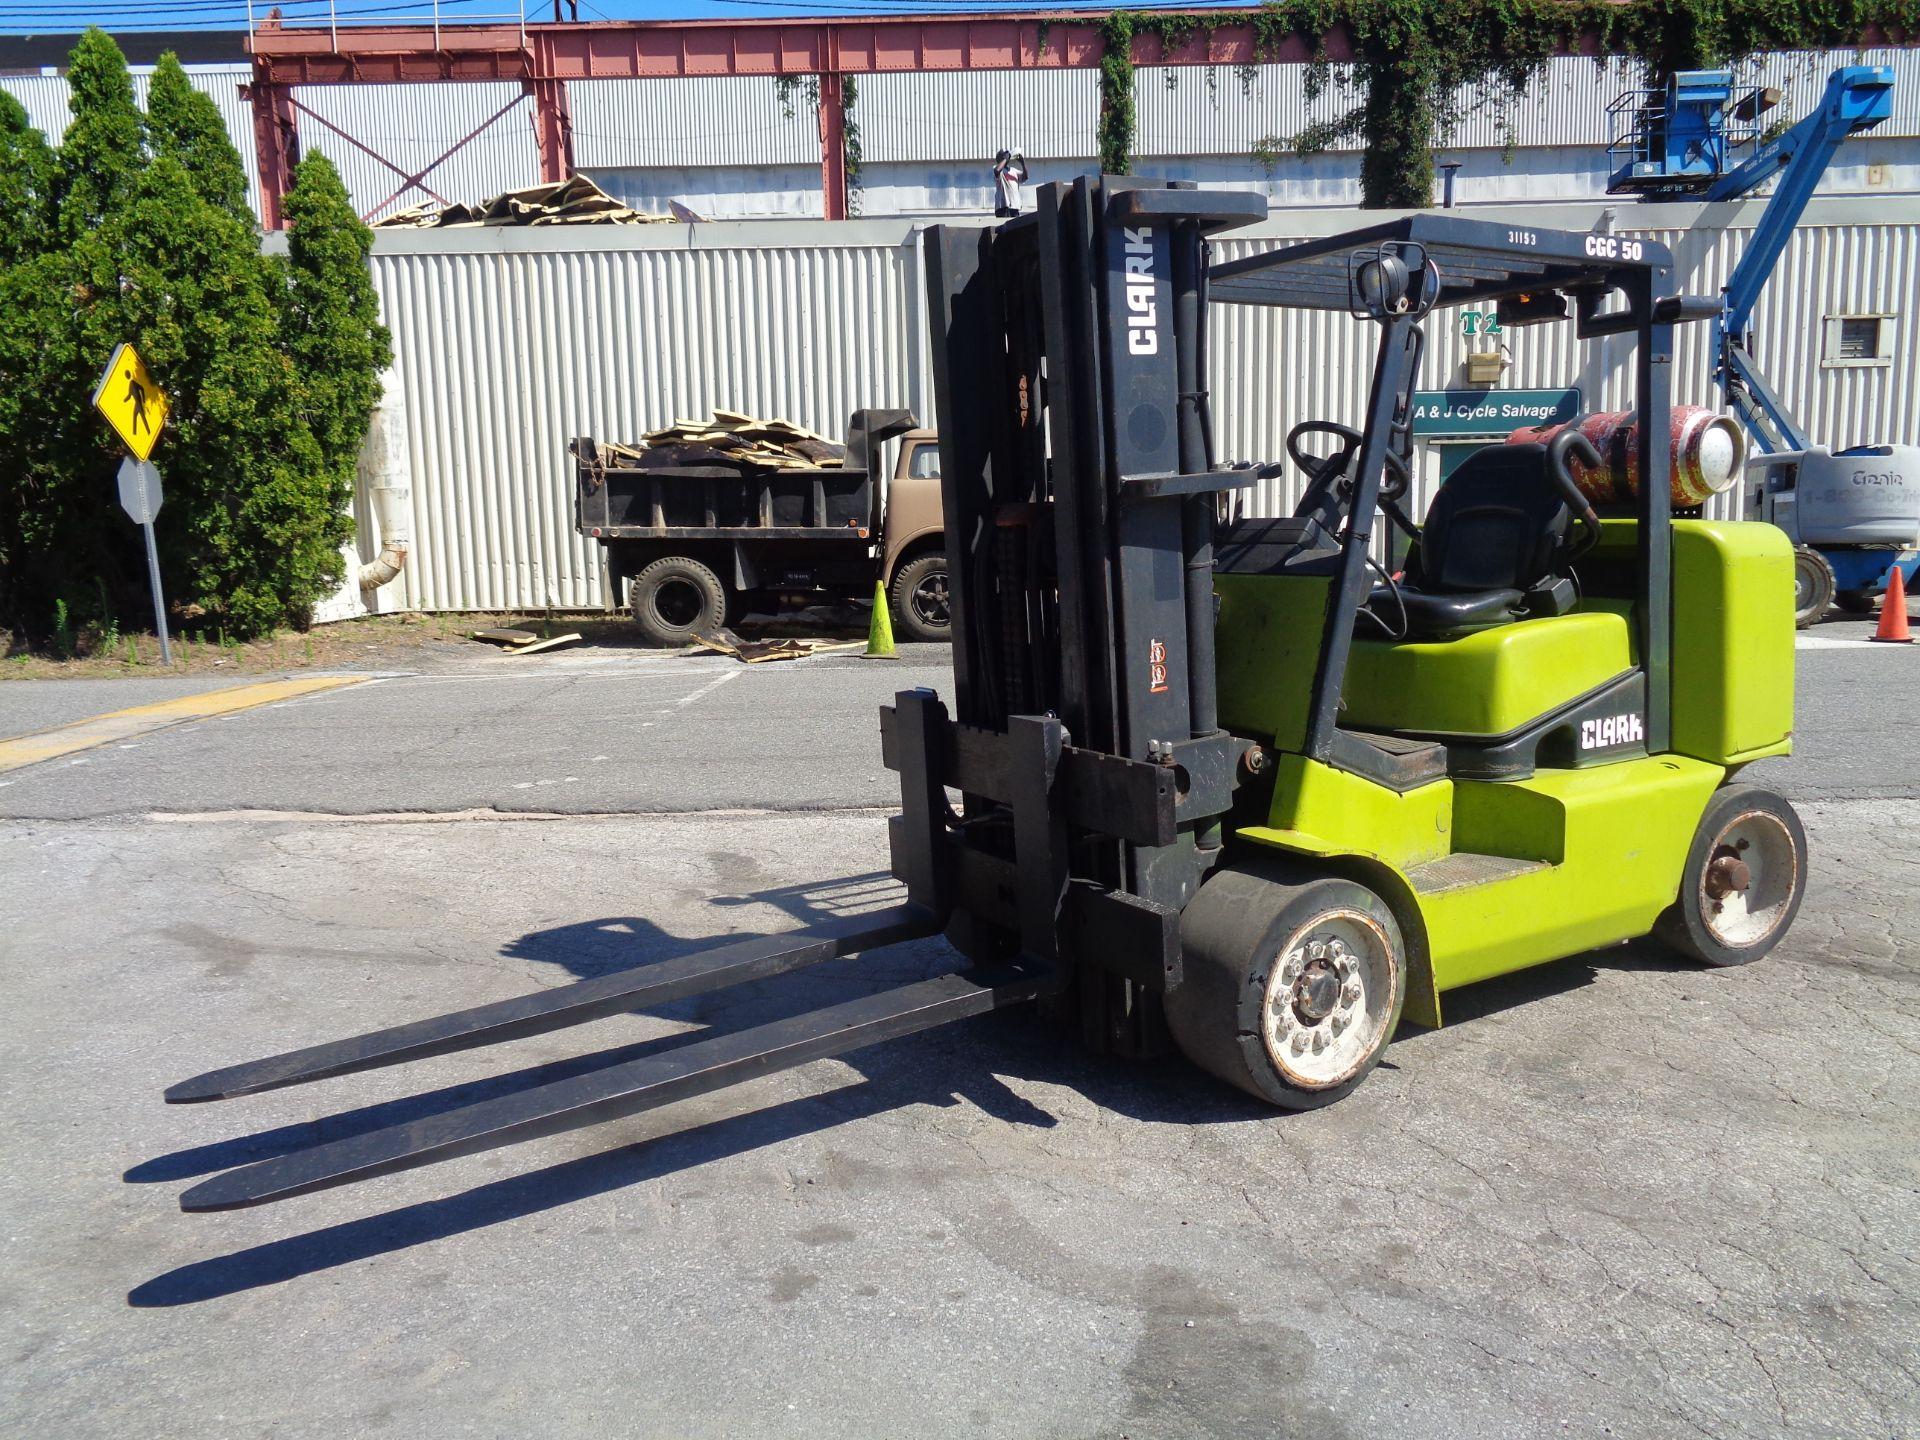 2014 Clark CGC500 10,000 lb Forklift - Image 5 of 12